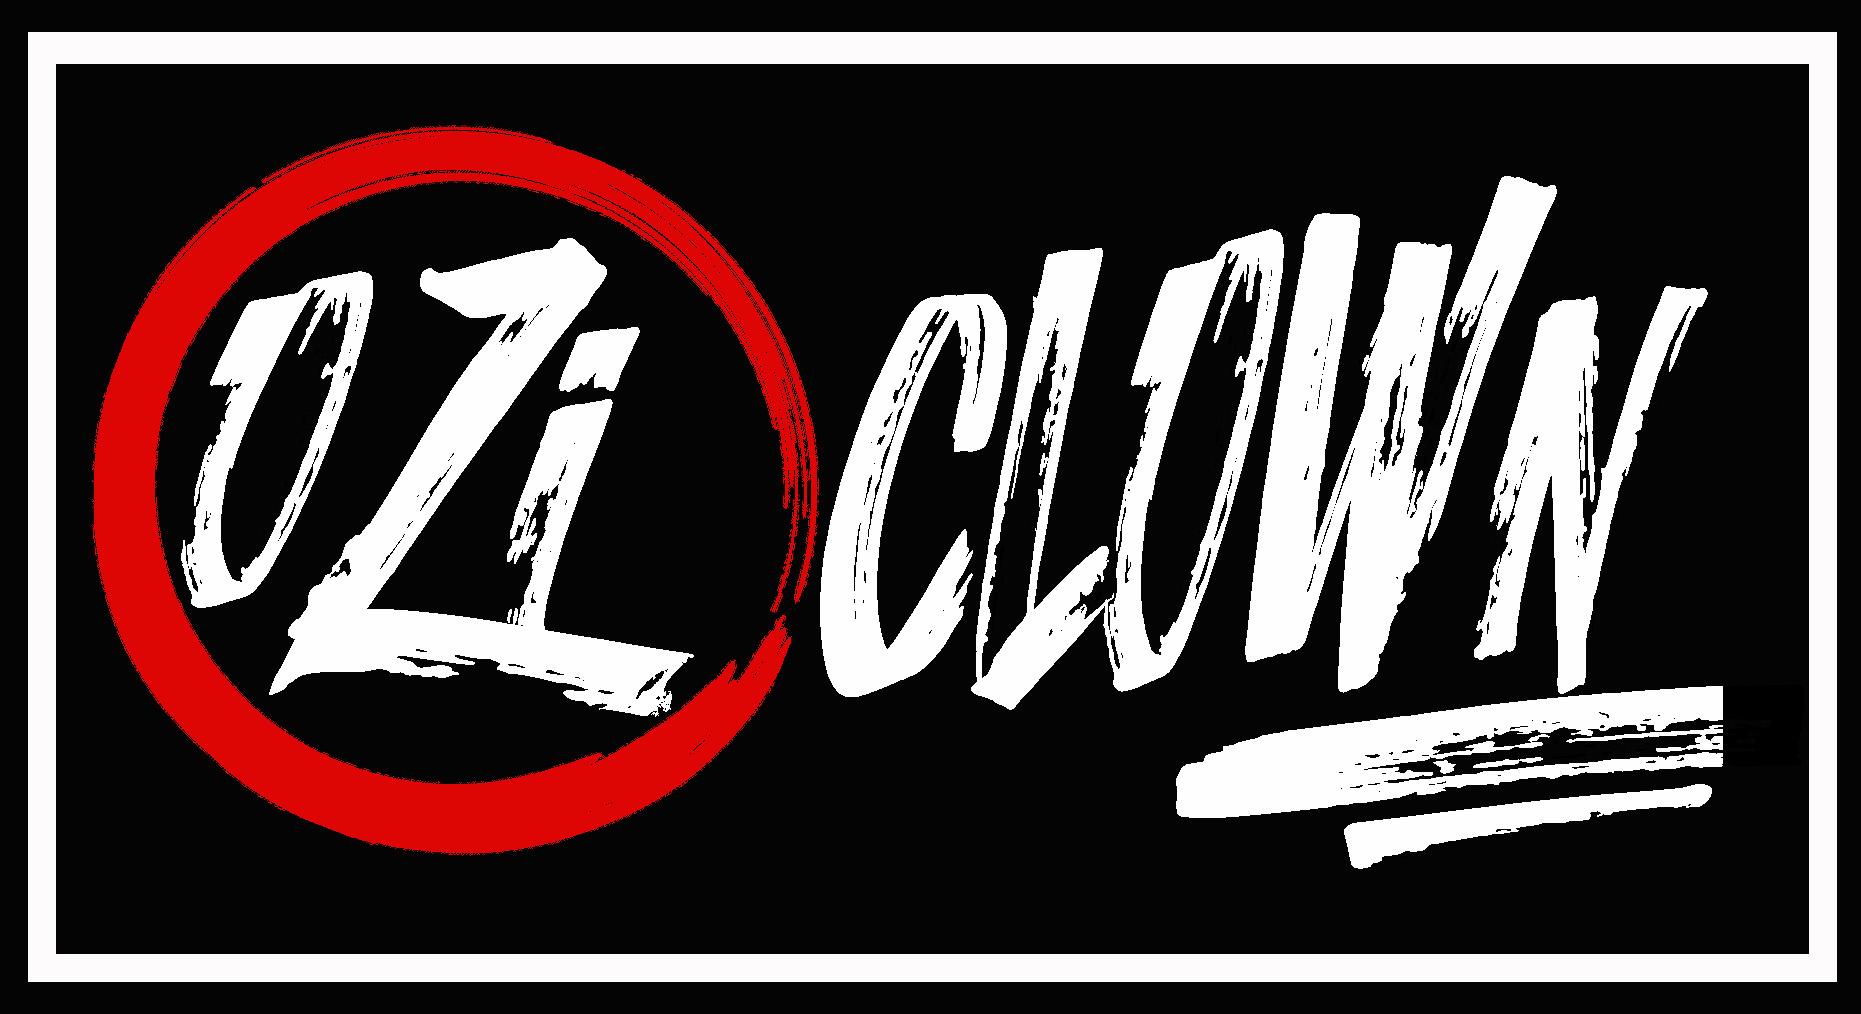 Ozi Clown